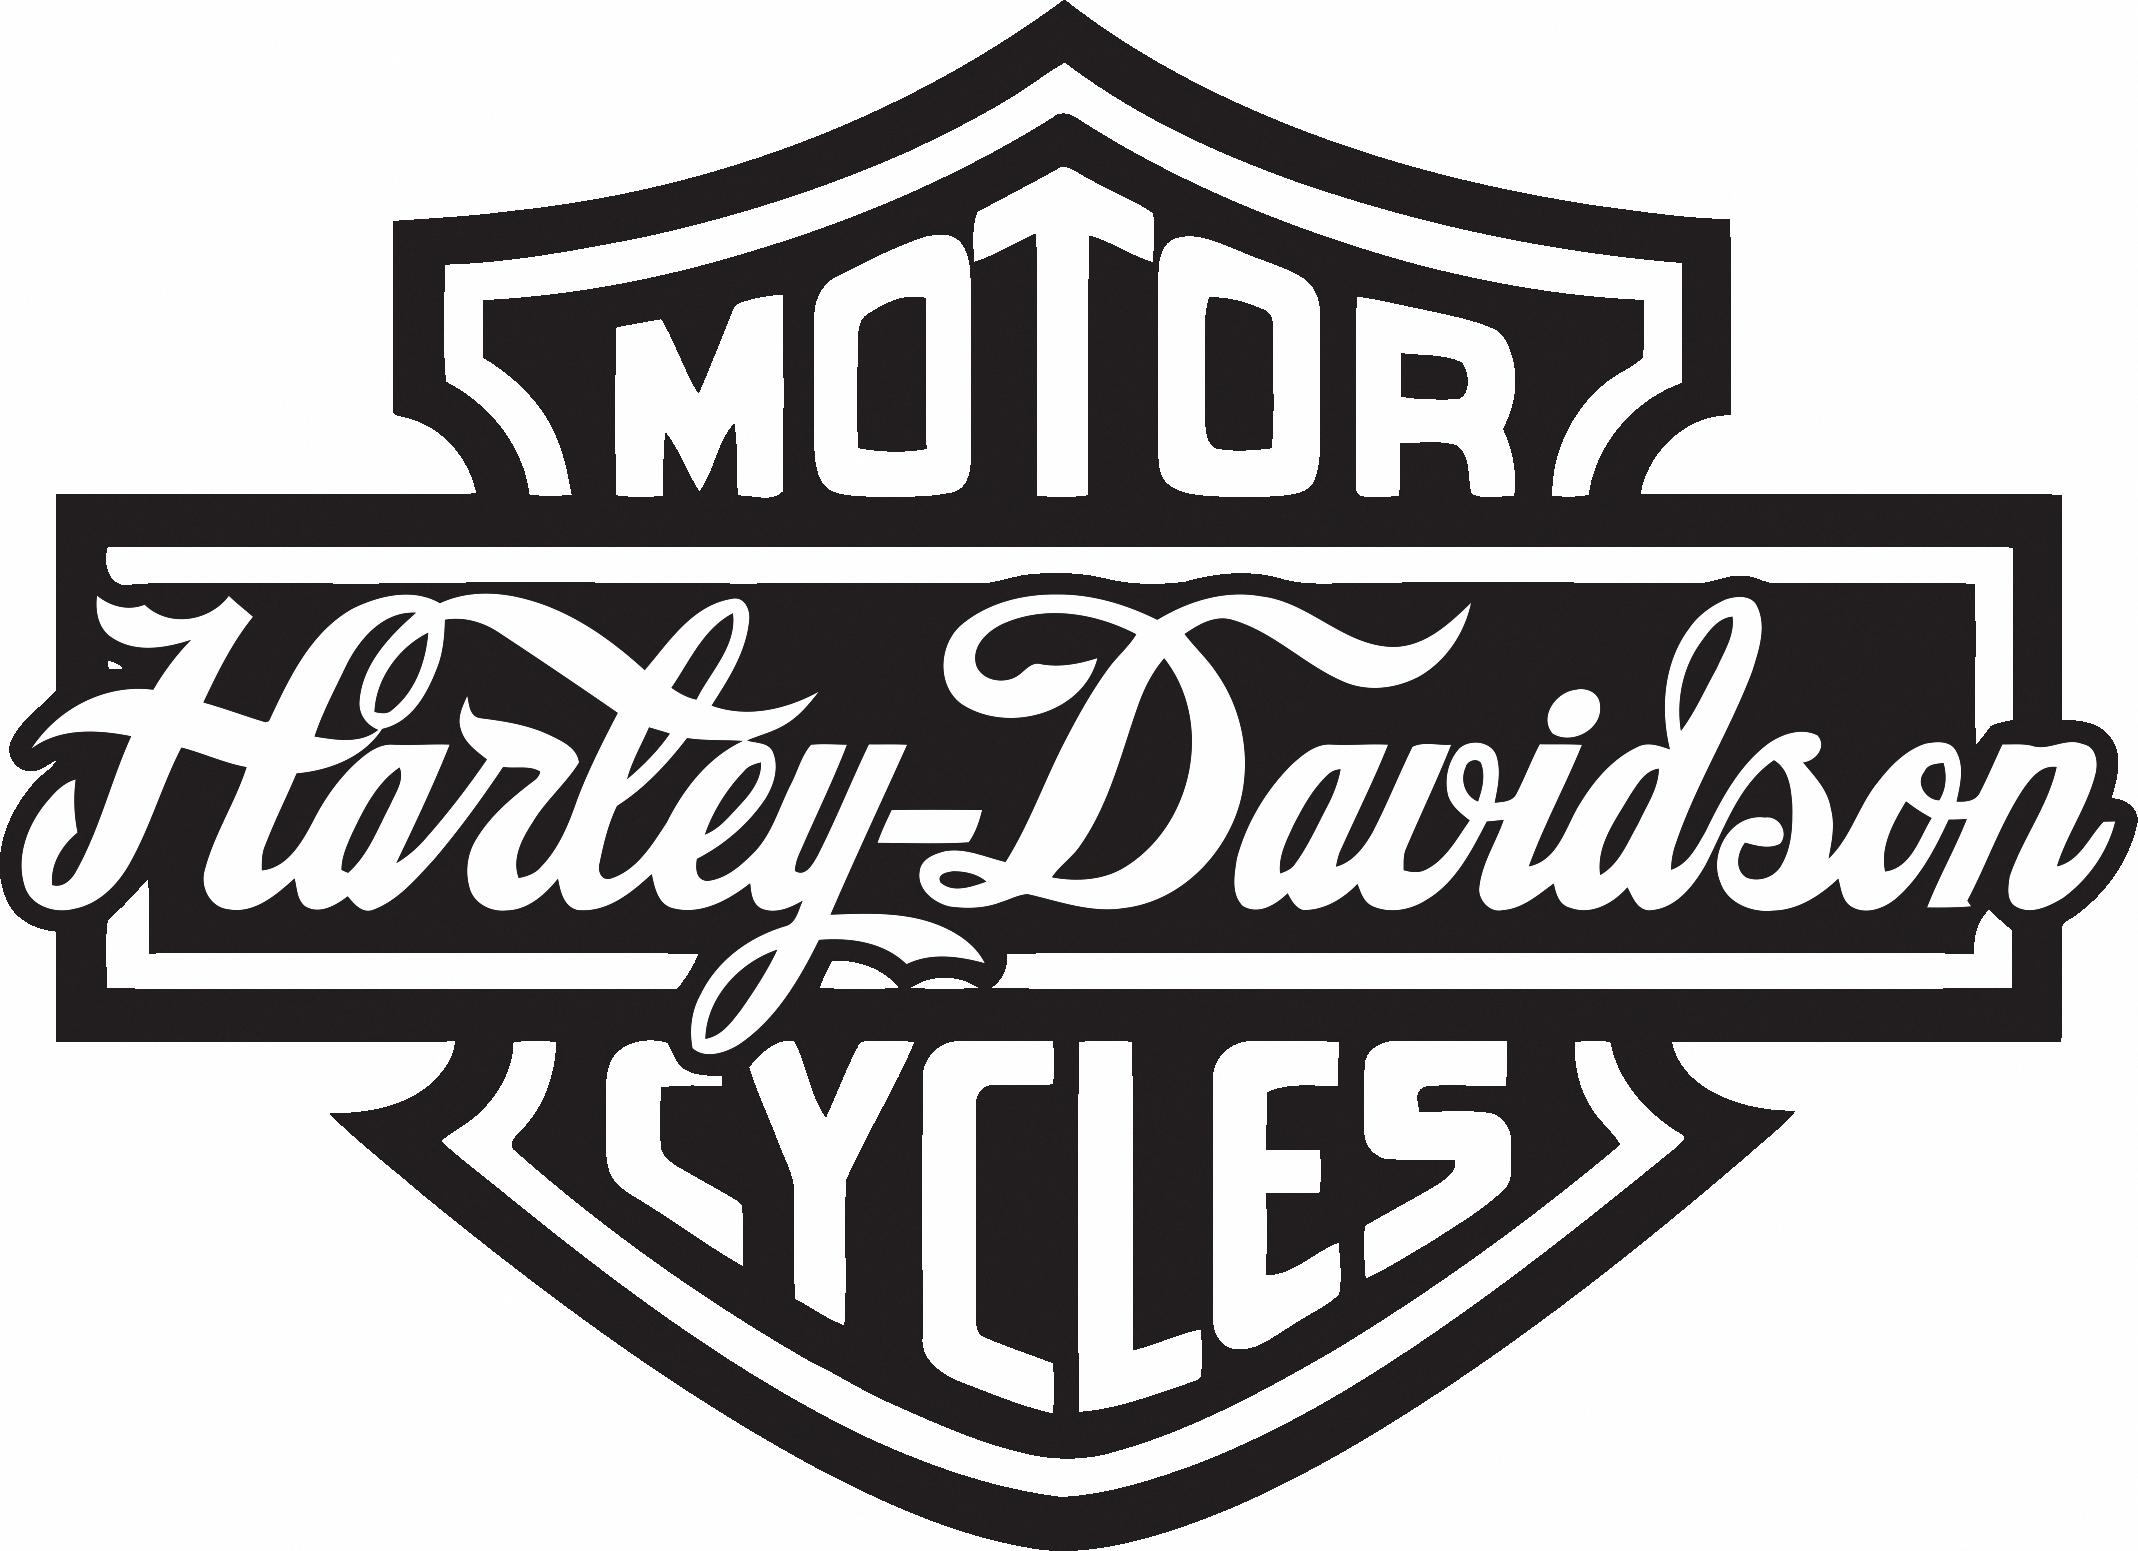 Harley Davidson Logo Harleydavidsonroadking Harley Davidson Decals Harley Davidson Logo Harley Davidson